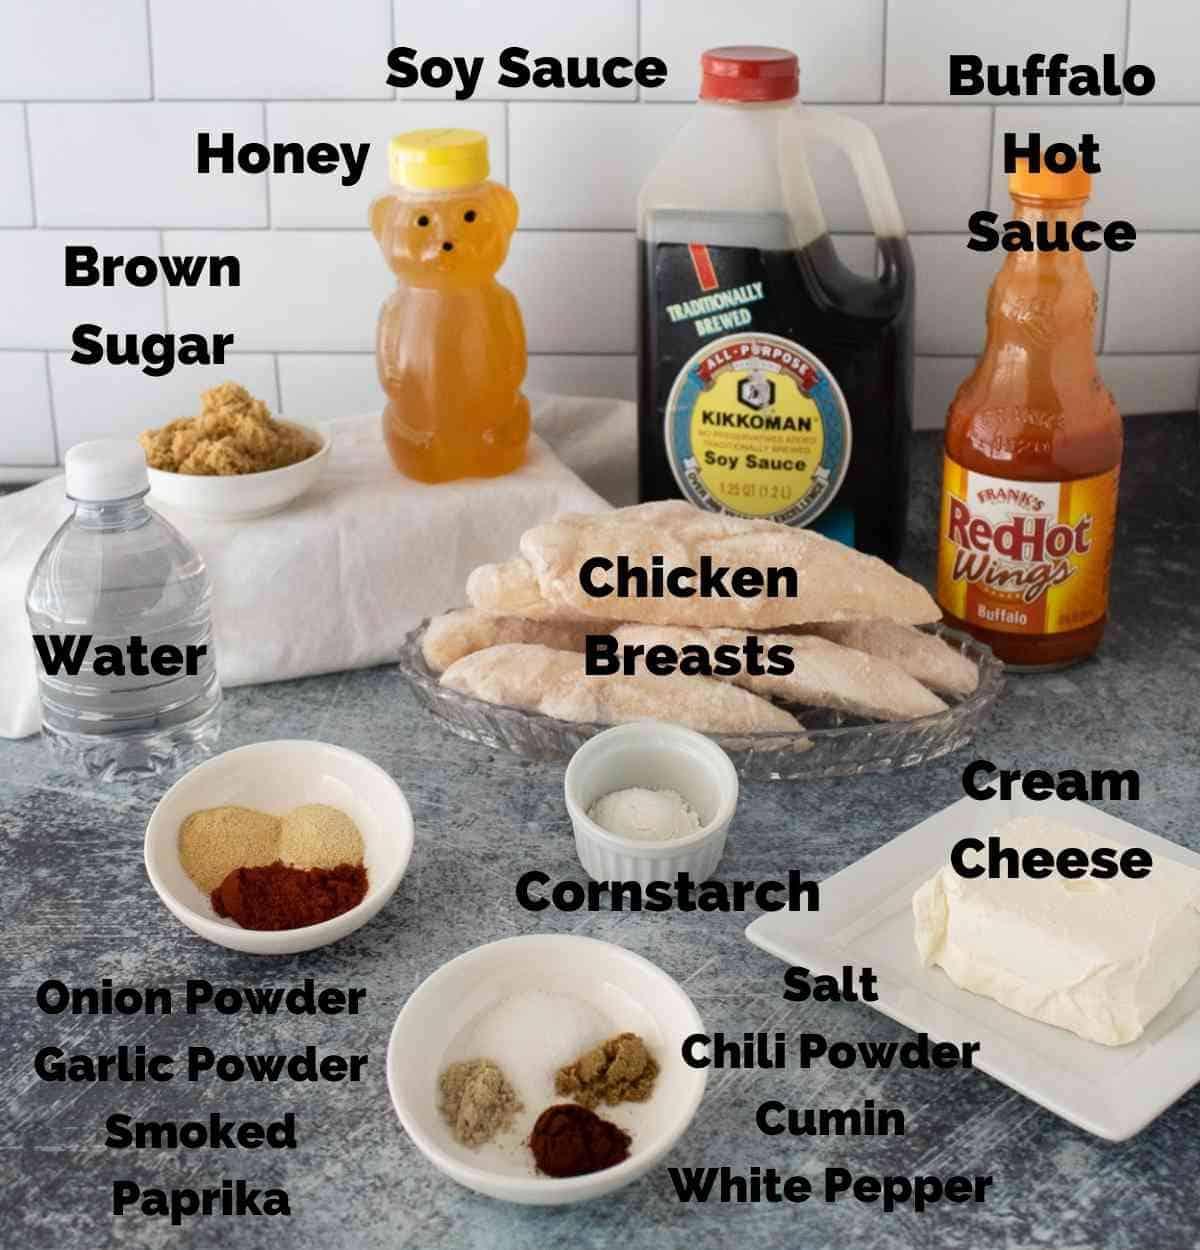 Ingredients for buffalo chicken quesadillas